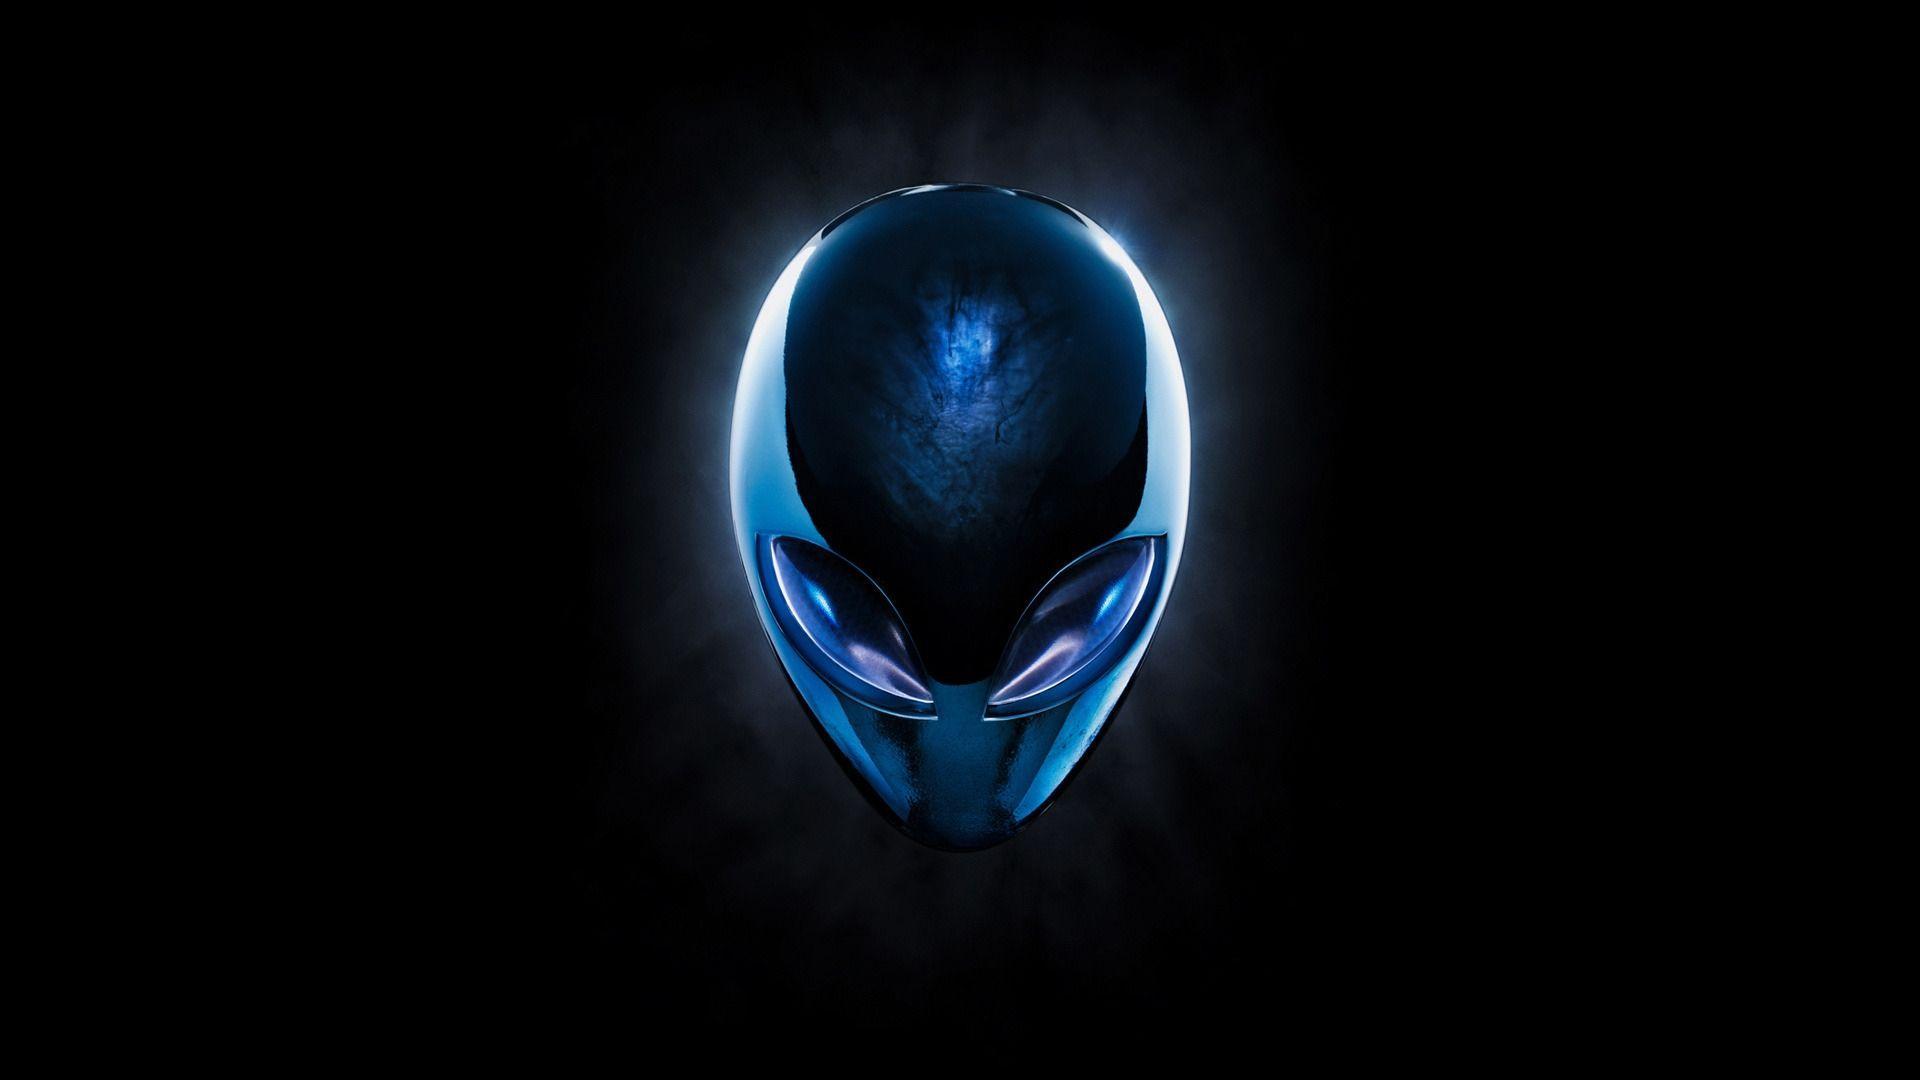 Alienware 4k Ultra Hd Wallpapers Top Free Alienware 4k